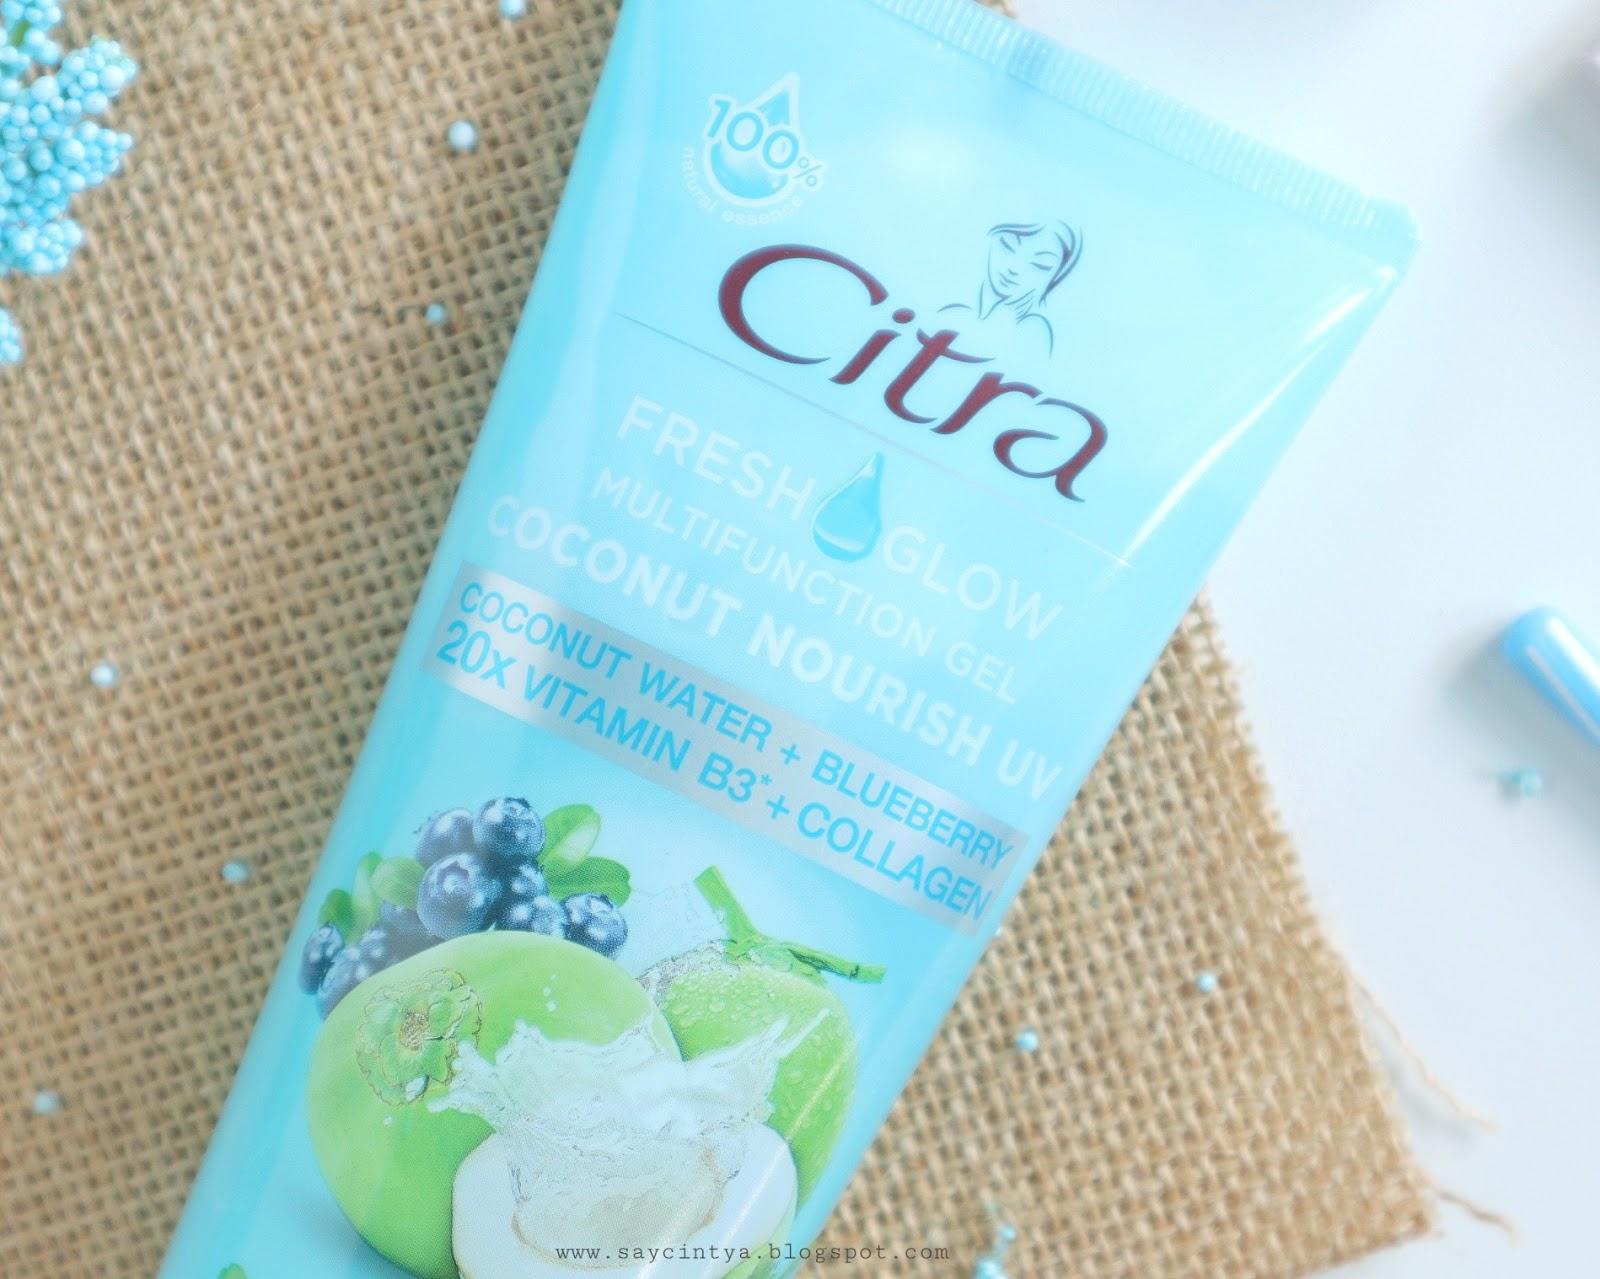 A Beauty Blog By Cintya Anggun Indonesian Beauty Blogger Review Citra Fresh Glow Multifunction Gel Coconut Nourish Uv Gel Multifungsi Dengan Harga Terjangkau